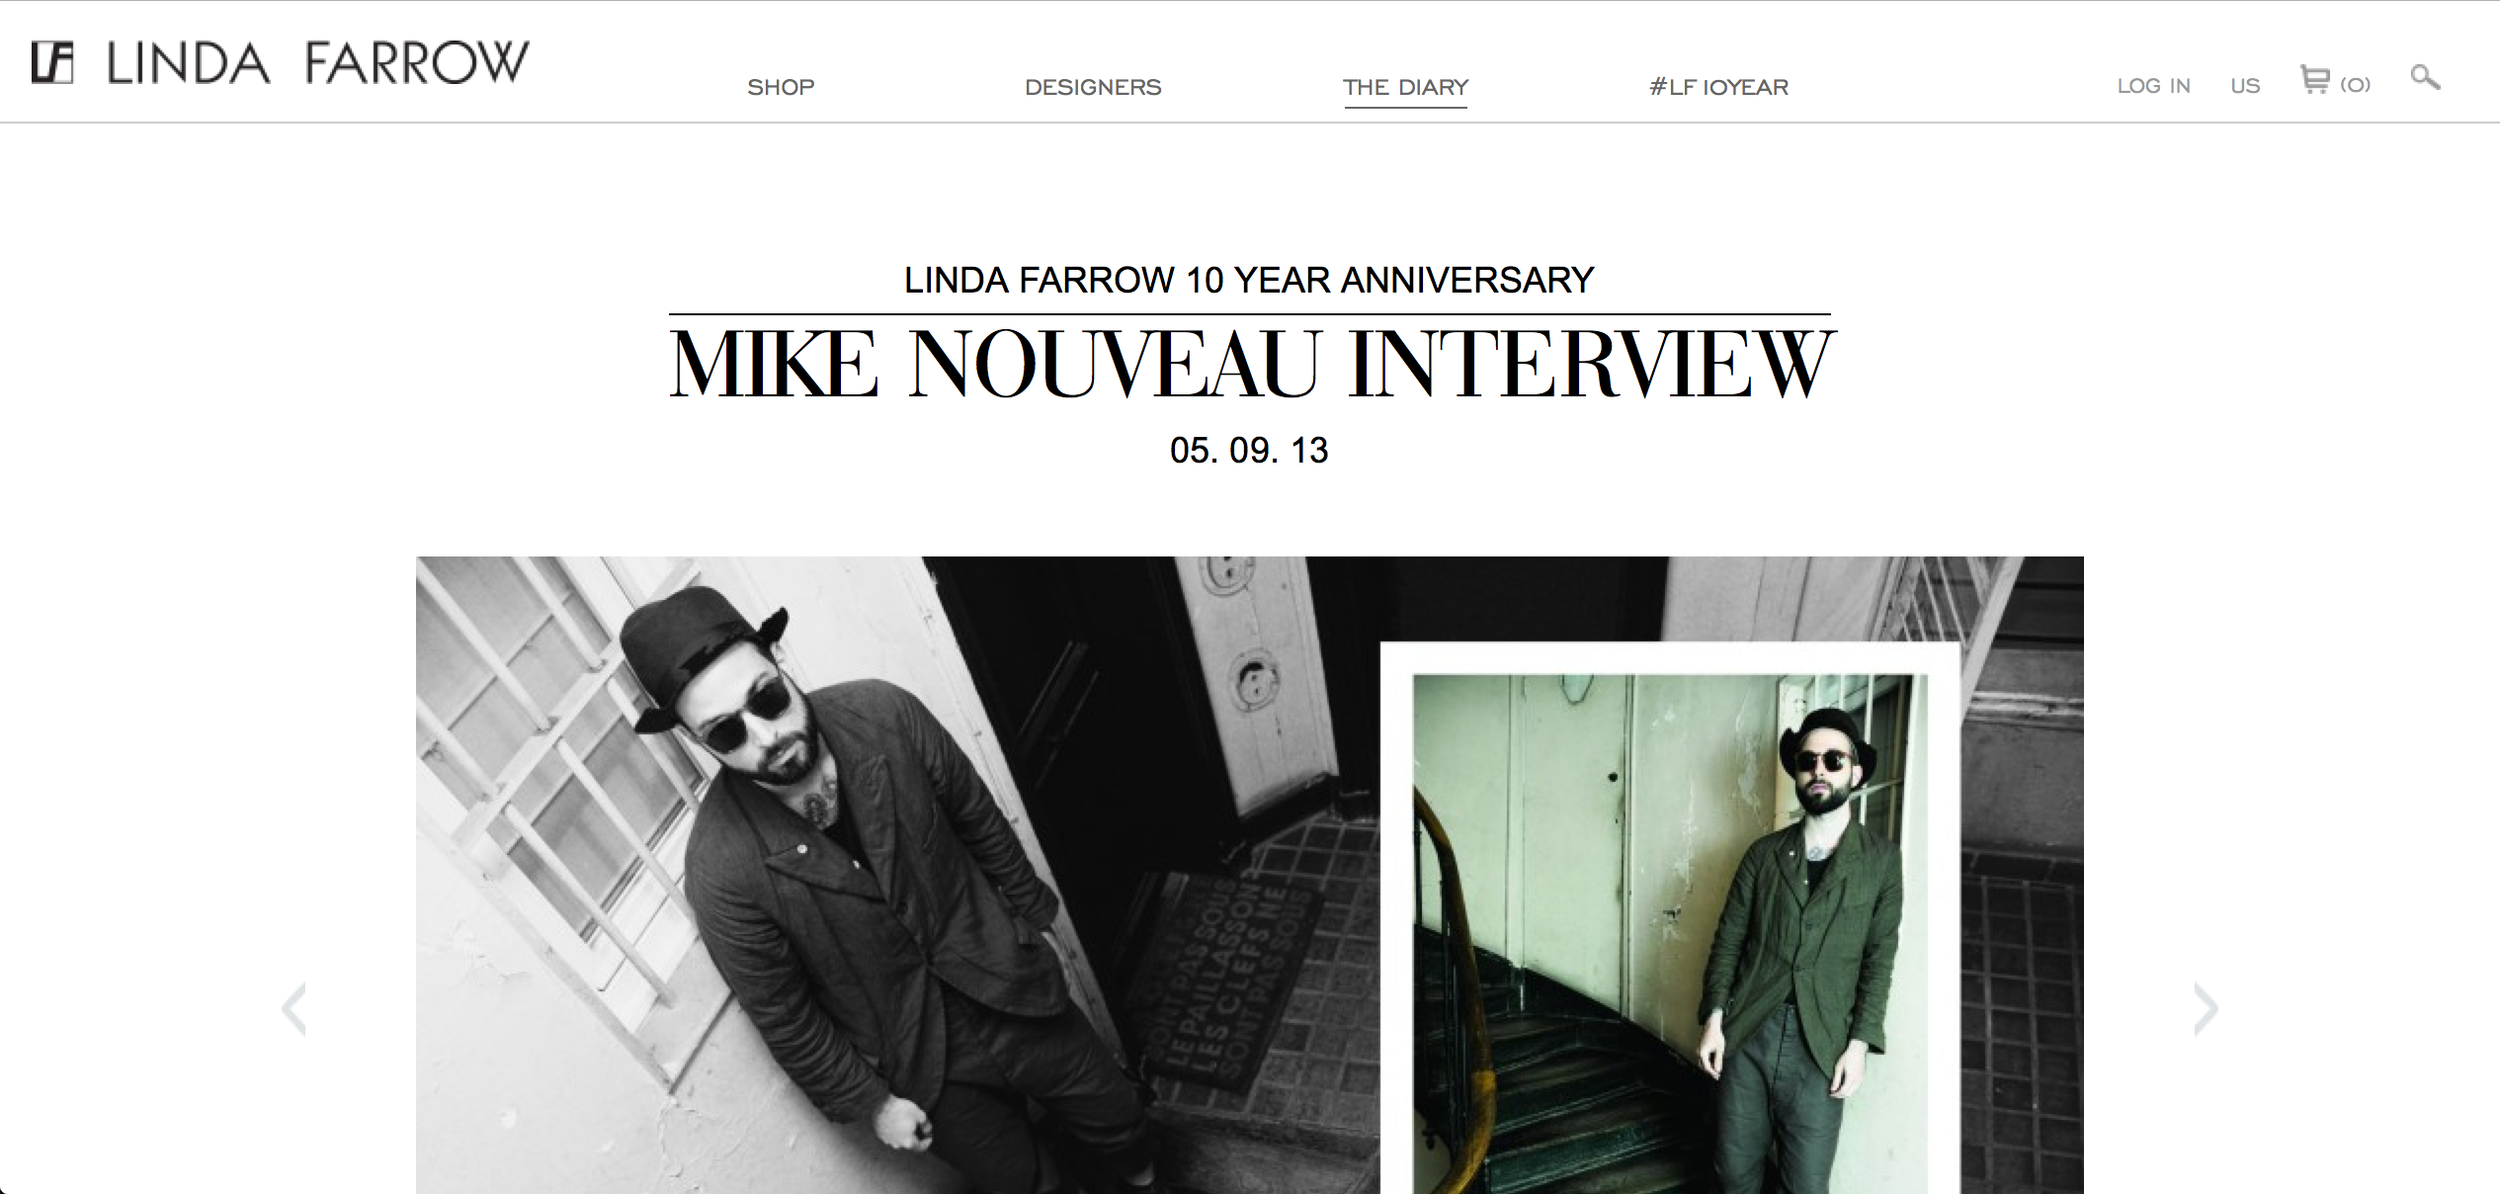 Linda Farrow Interview